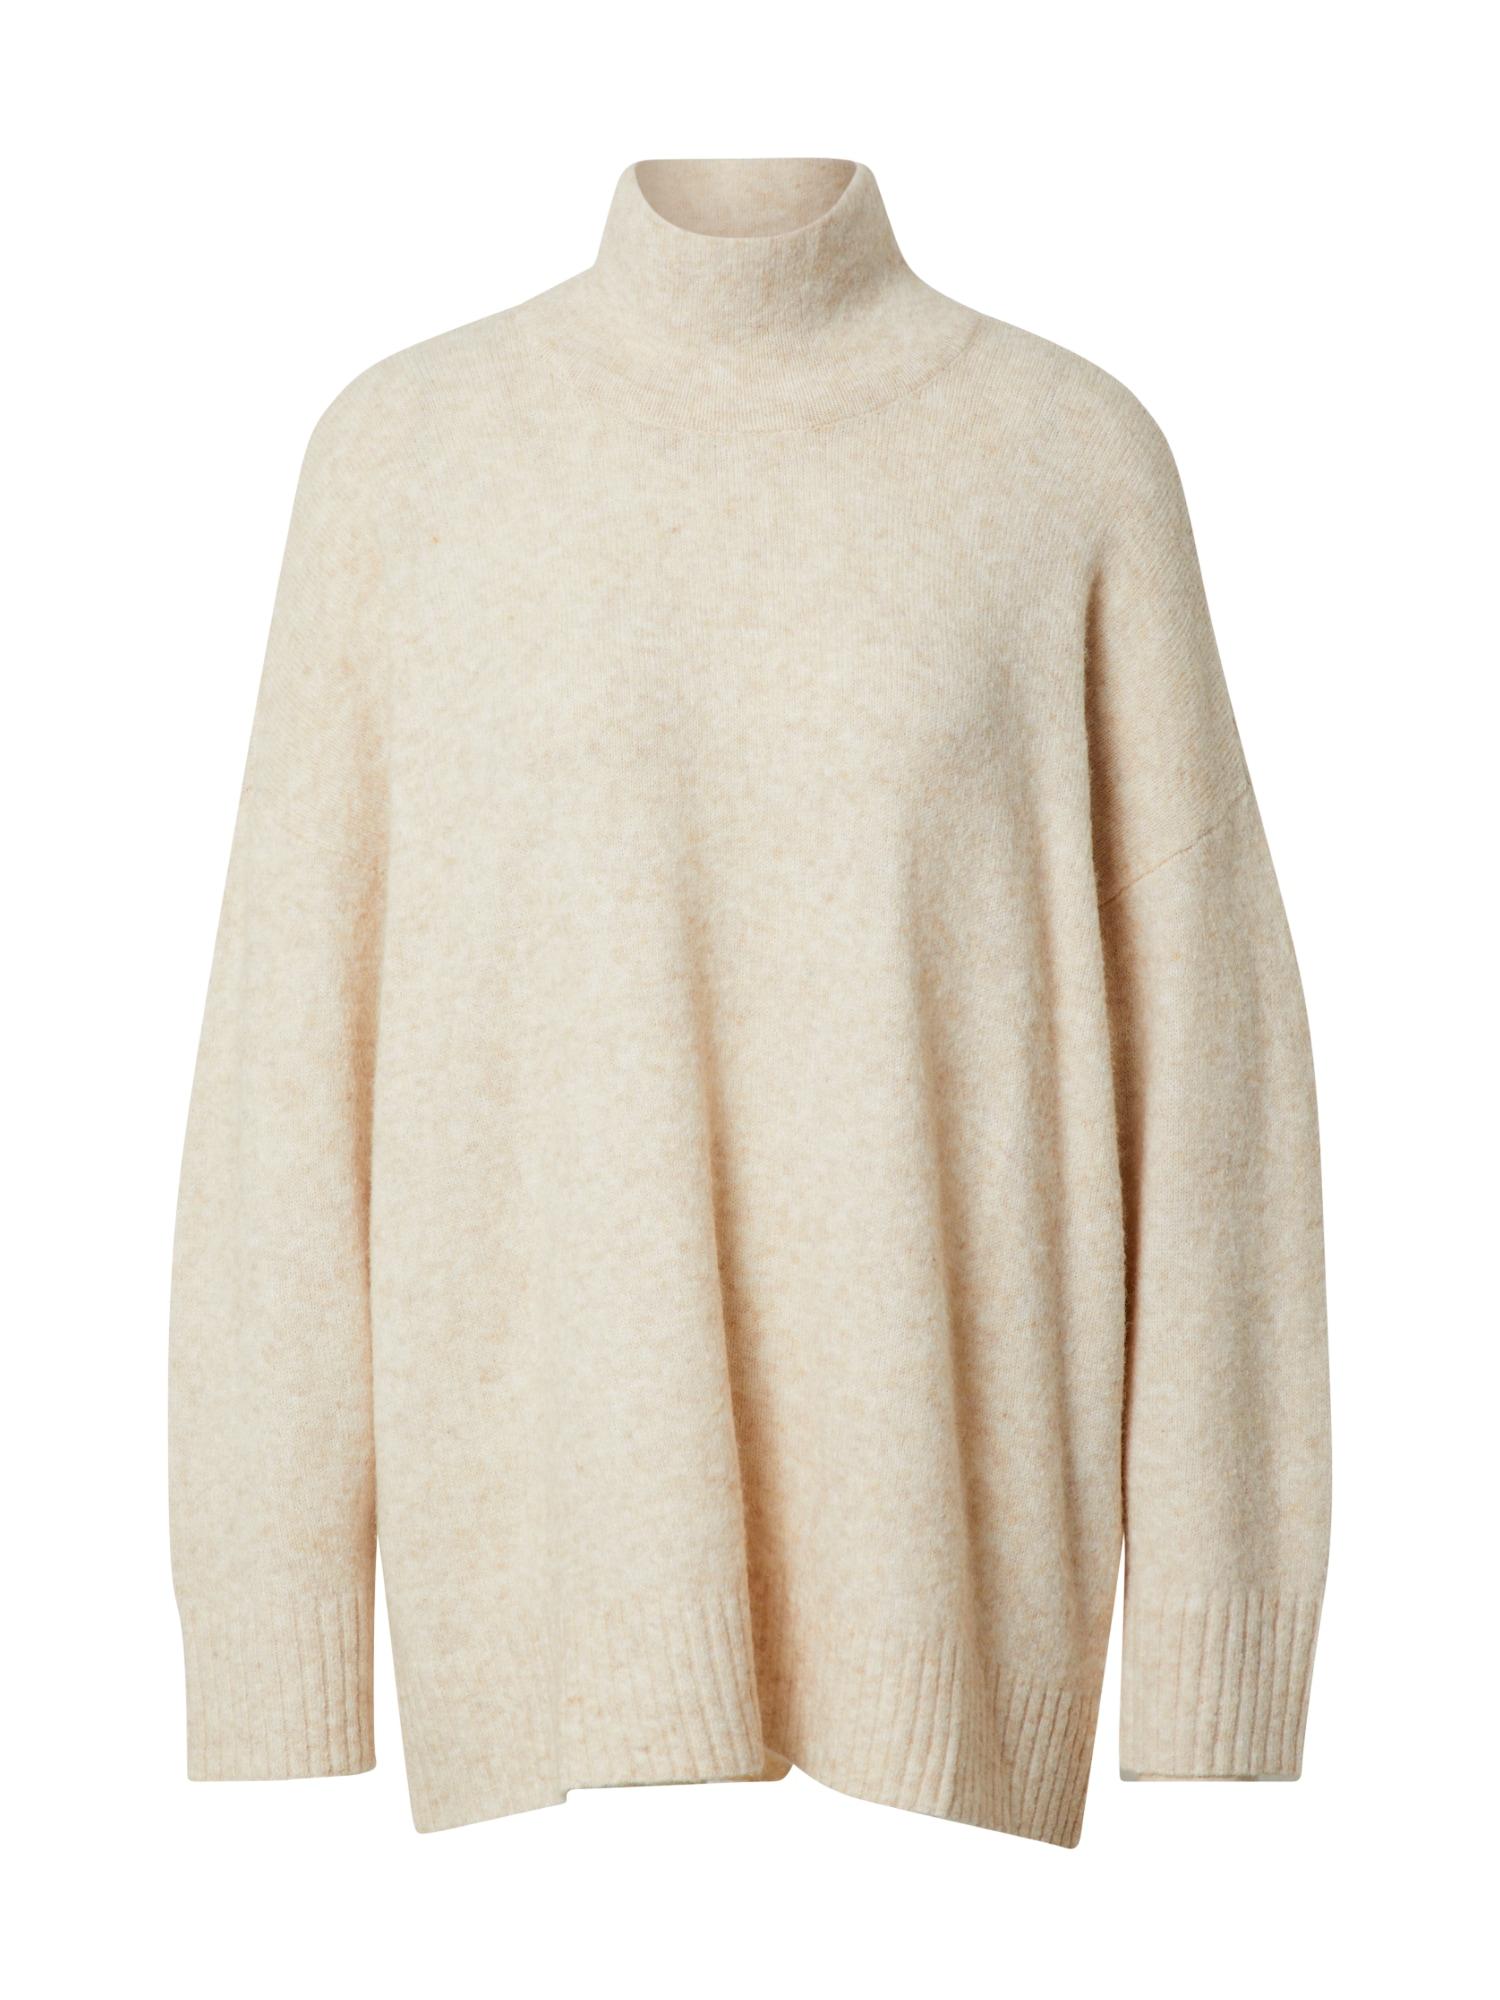 JUST FEMALE Laisvas megztinis marga smėlio spalva